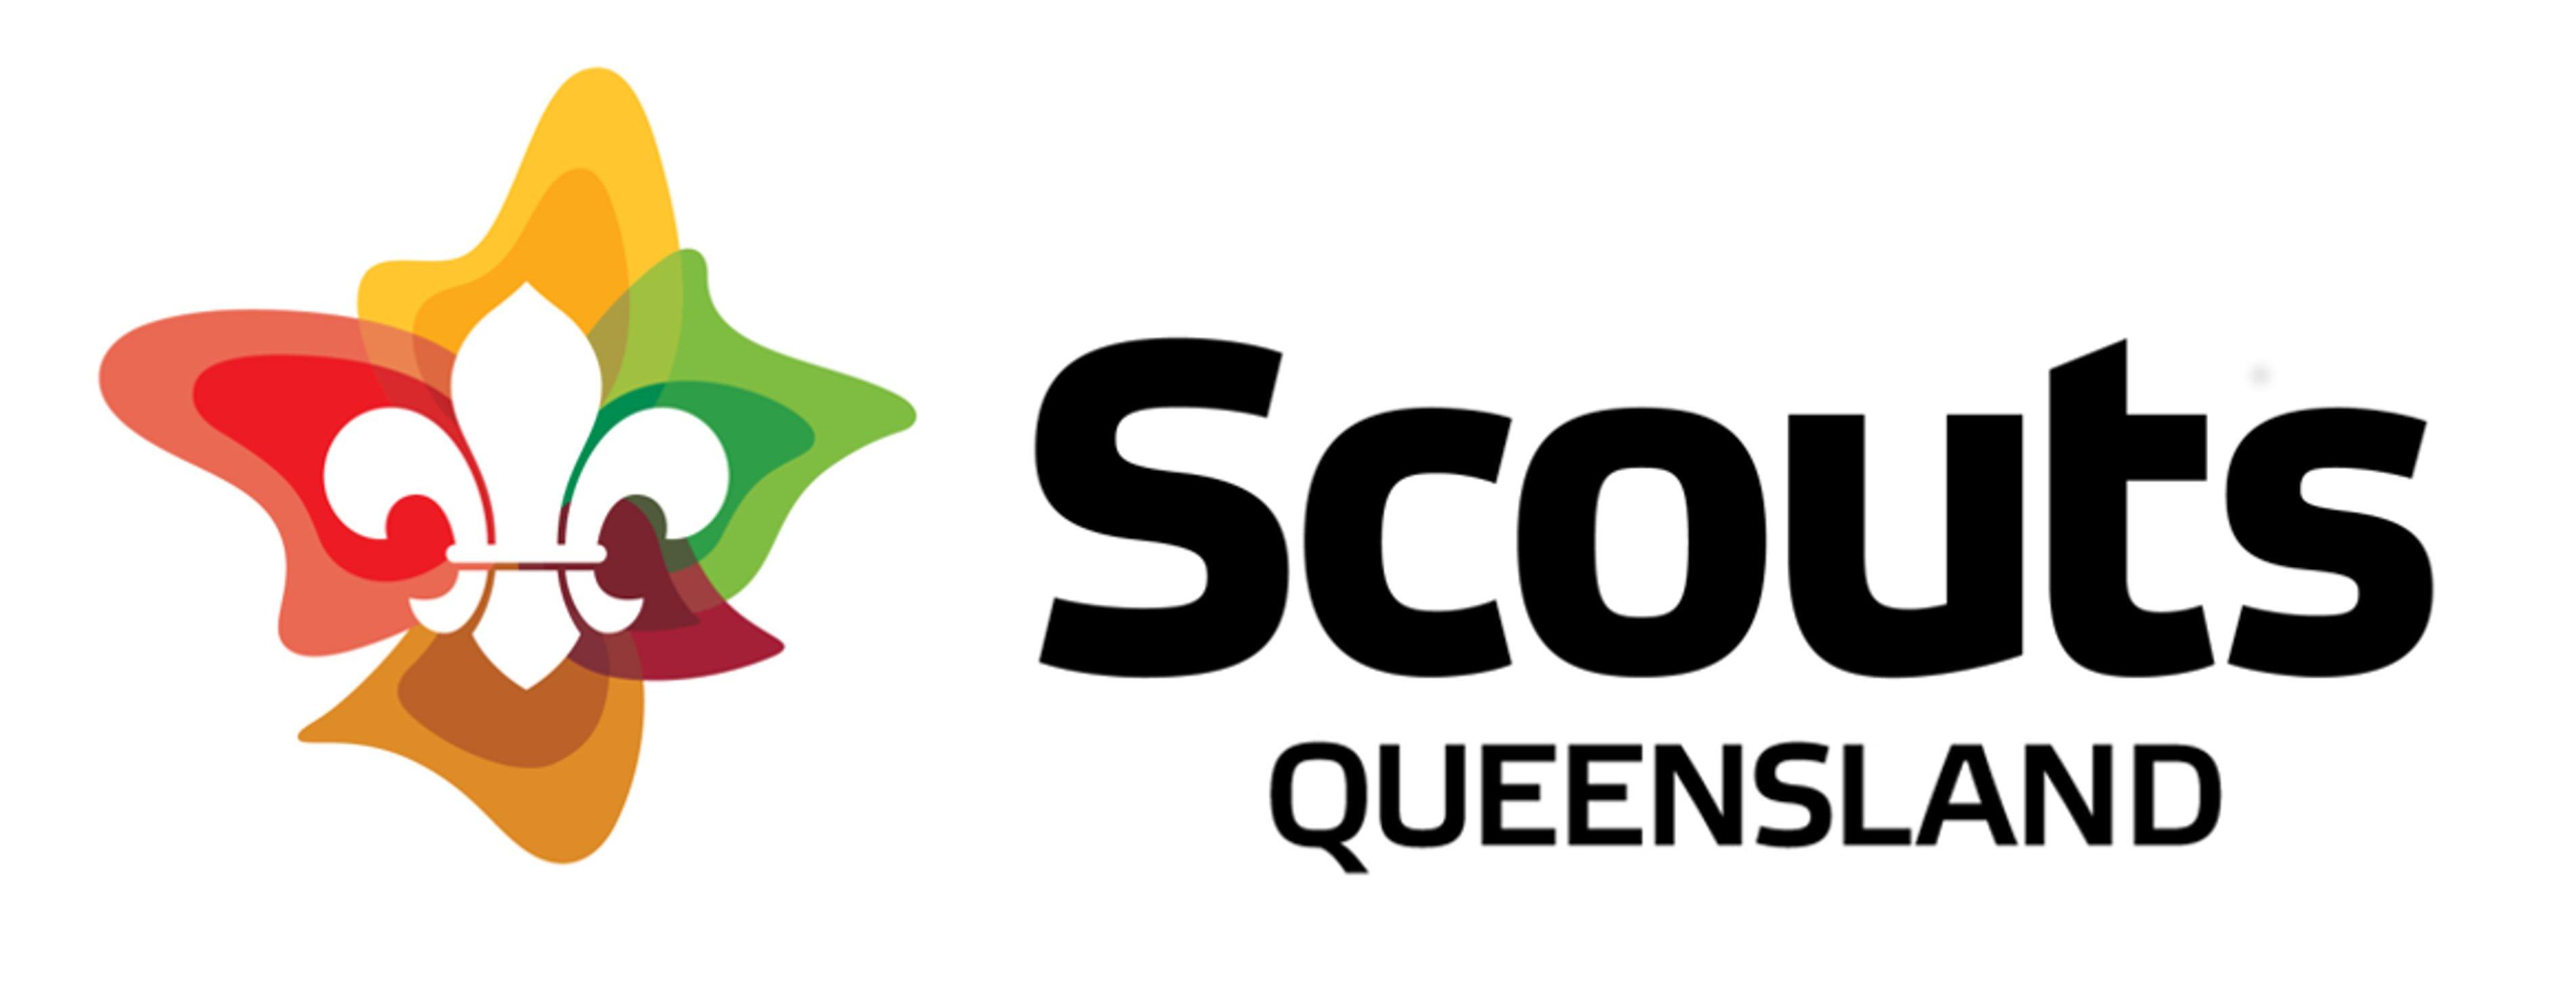 Central Coast Region Scouts